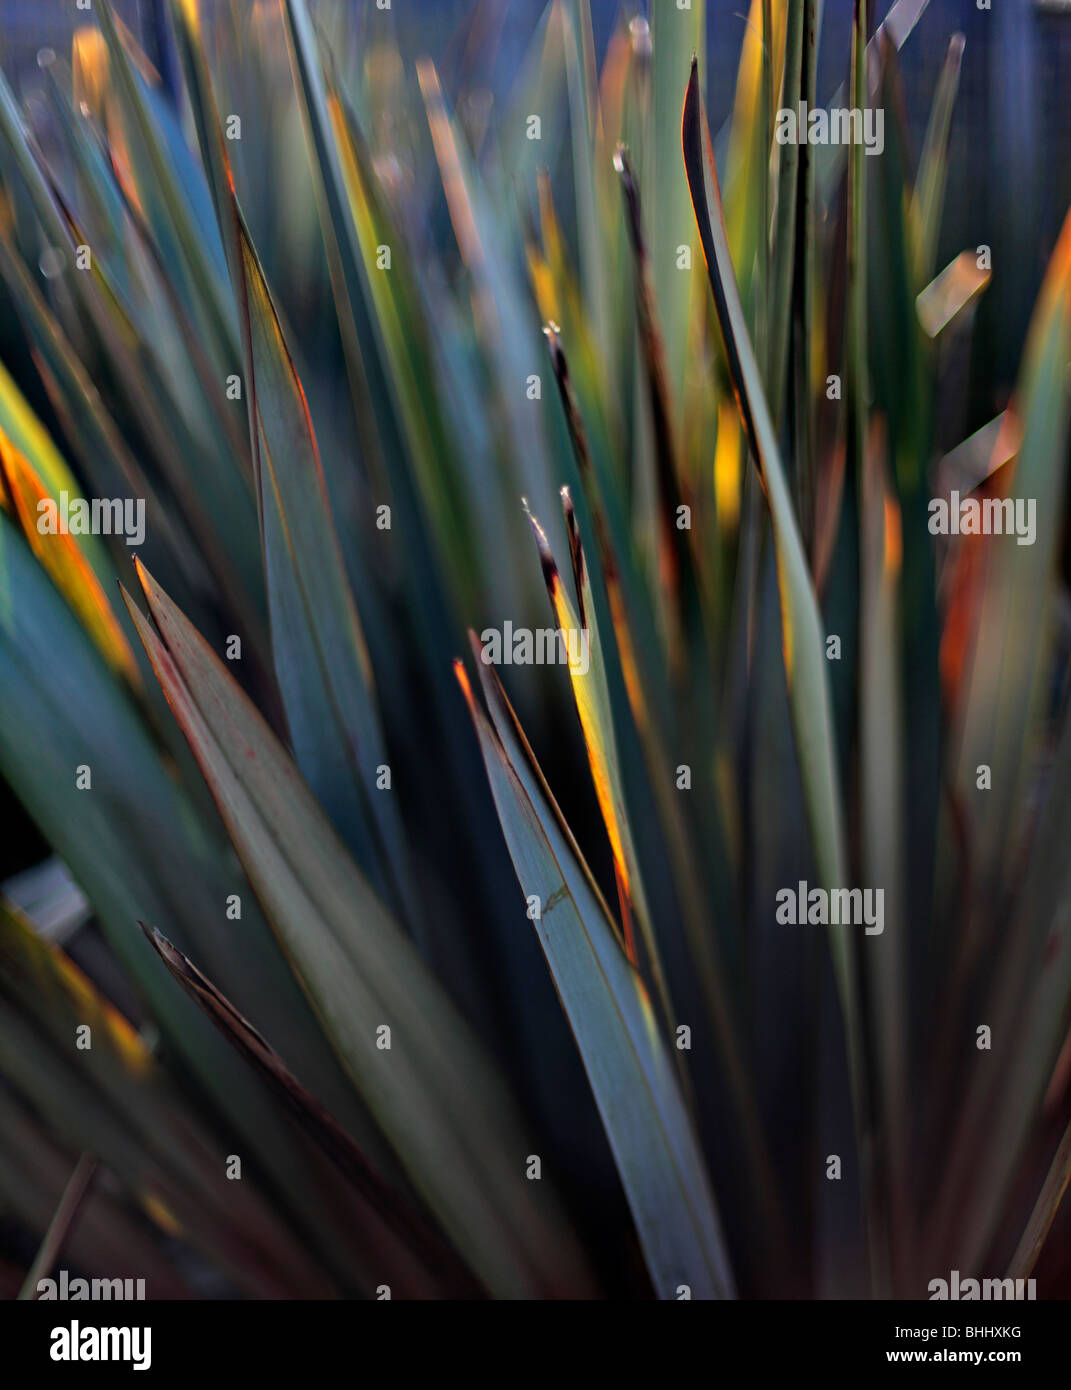 Phormium - Stock Image